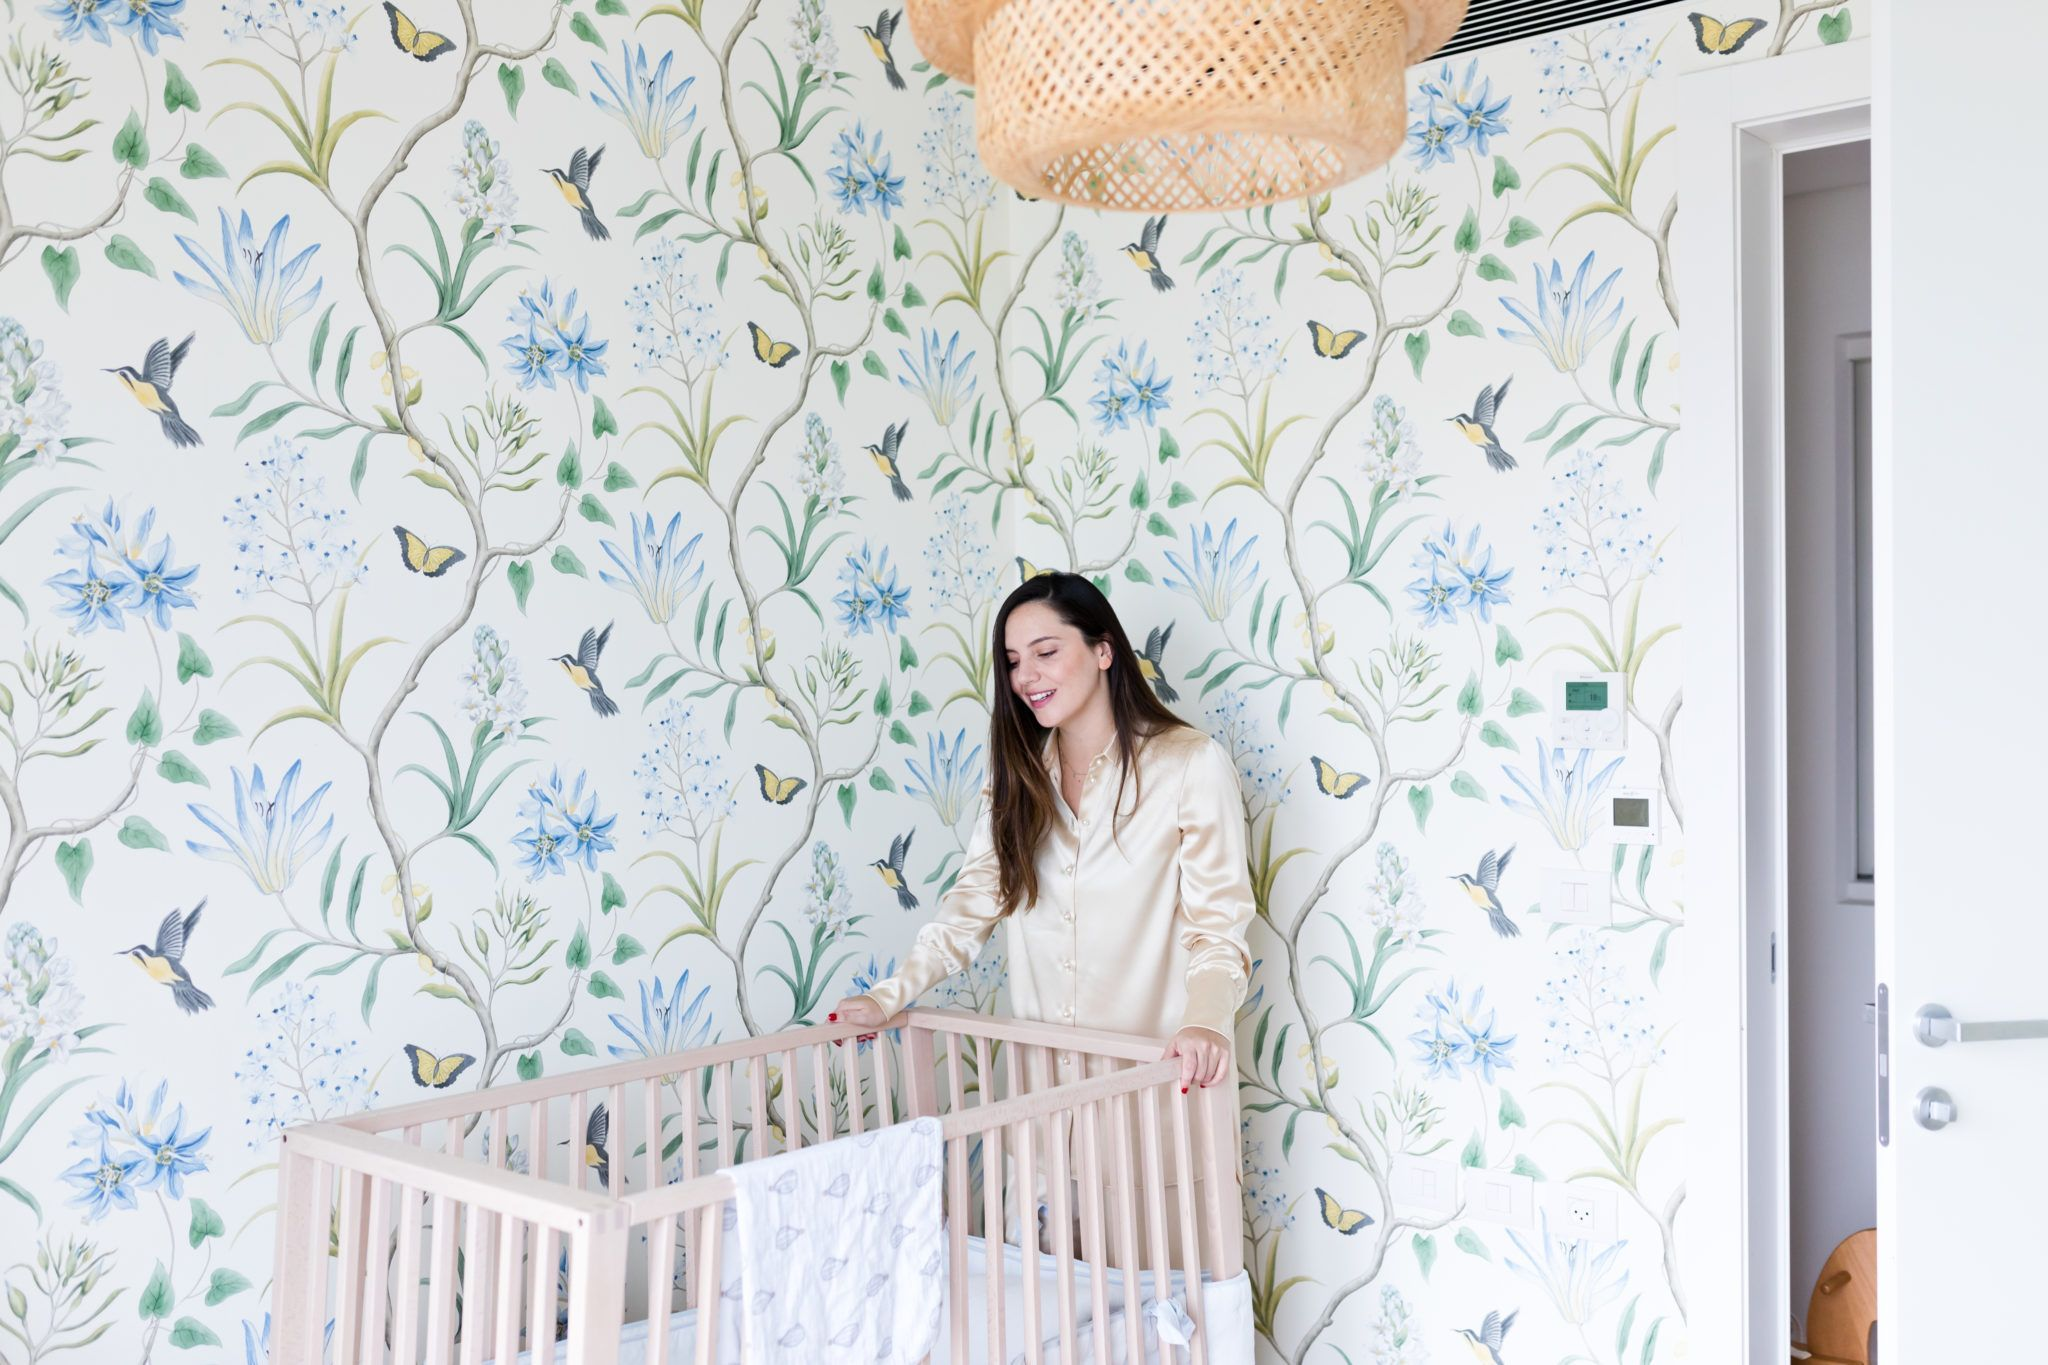 Welcome To Geffen S World Project Nursery Nursery Decor Inspiration Nursery Neutral Gender Neutral Nursery